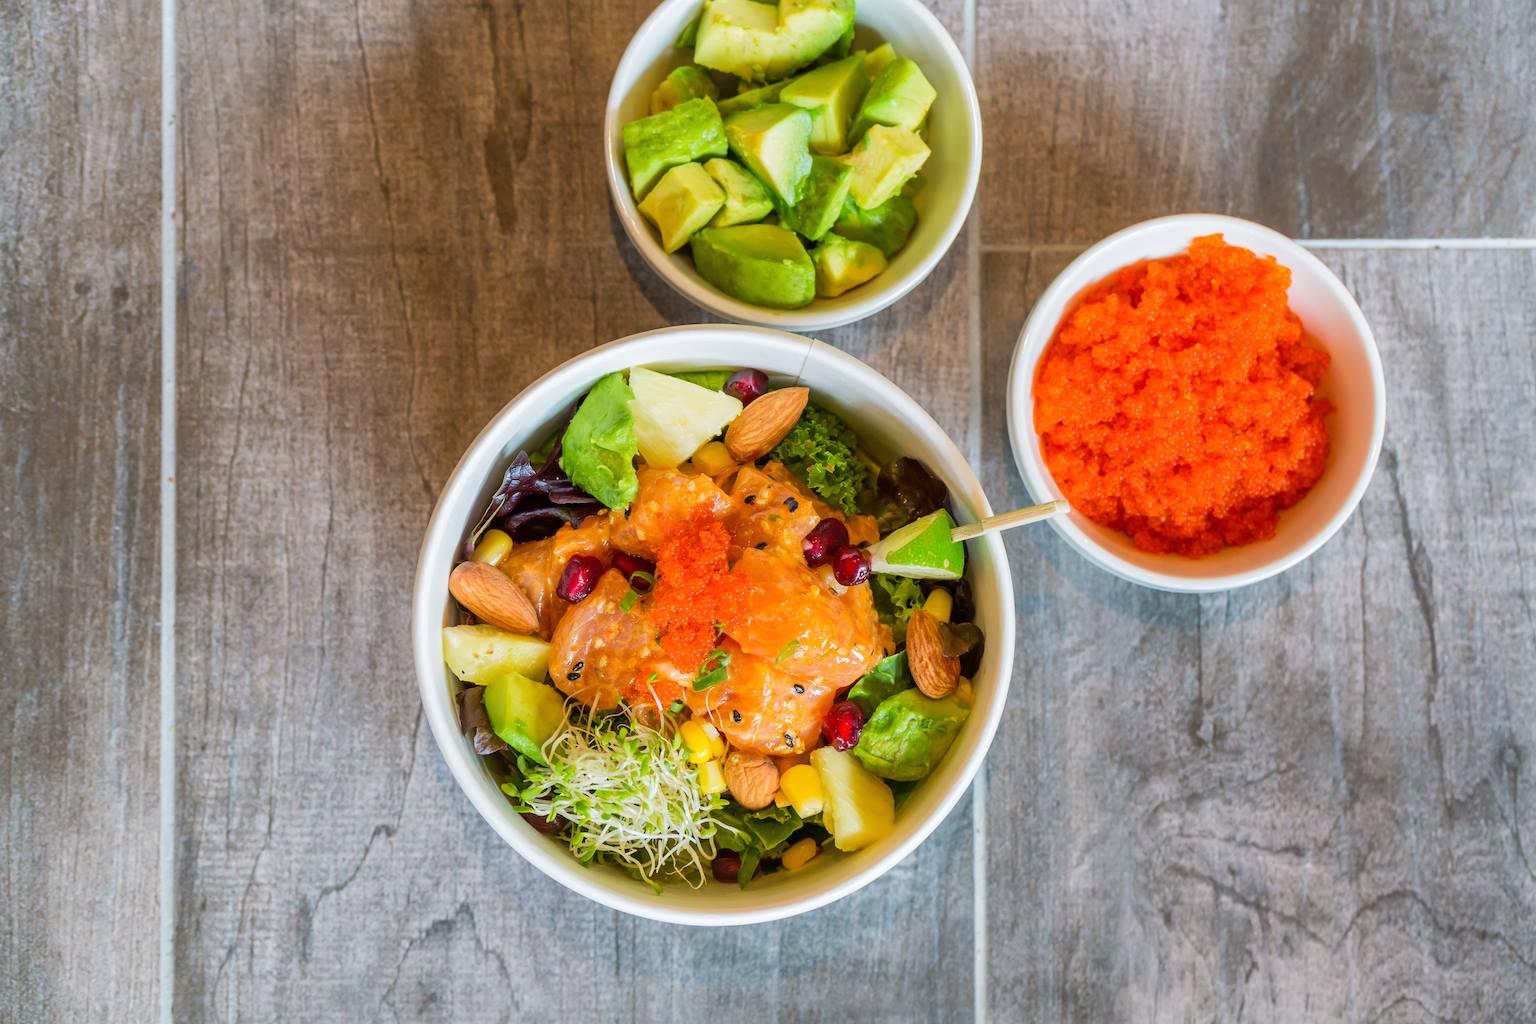 Healthy Singapore Food | Healthy Food Restaurant in CBD